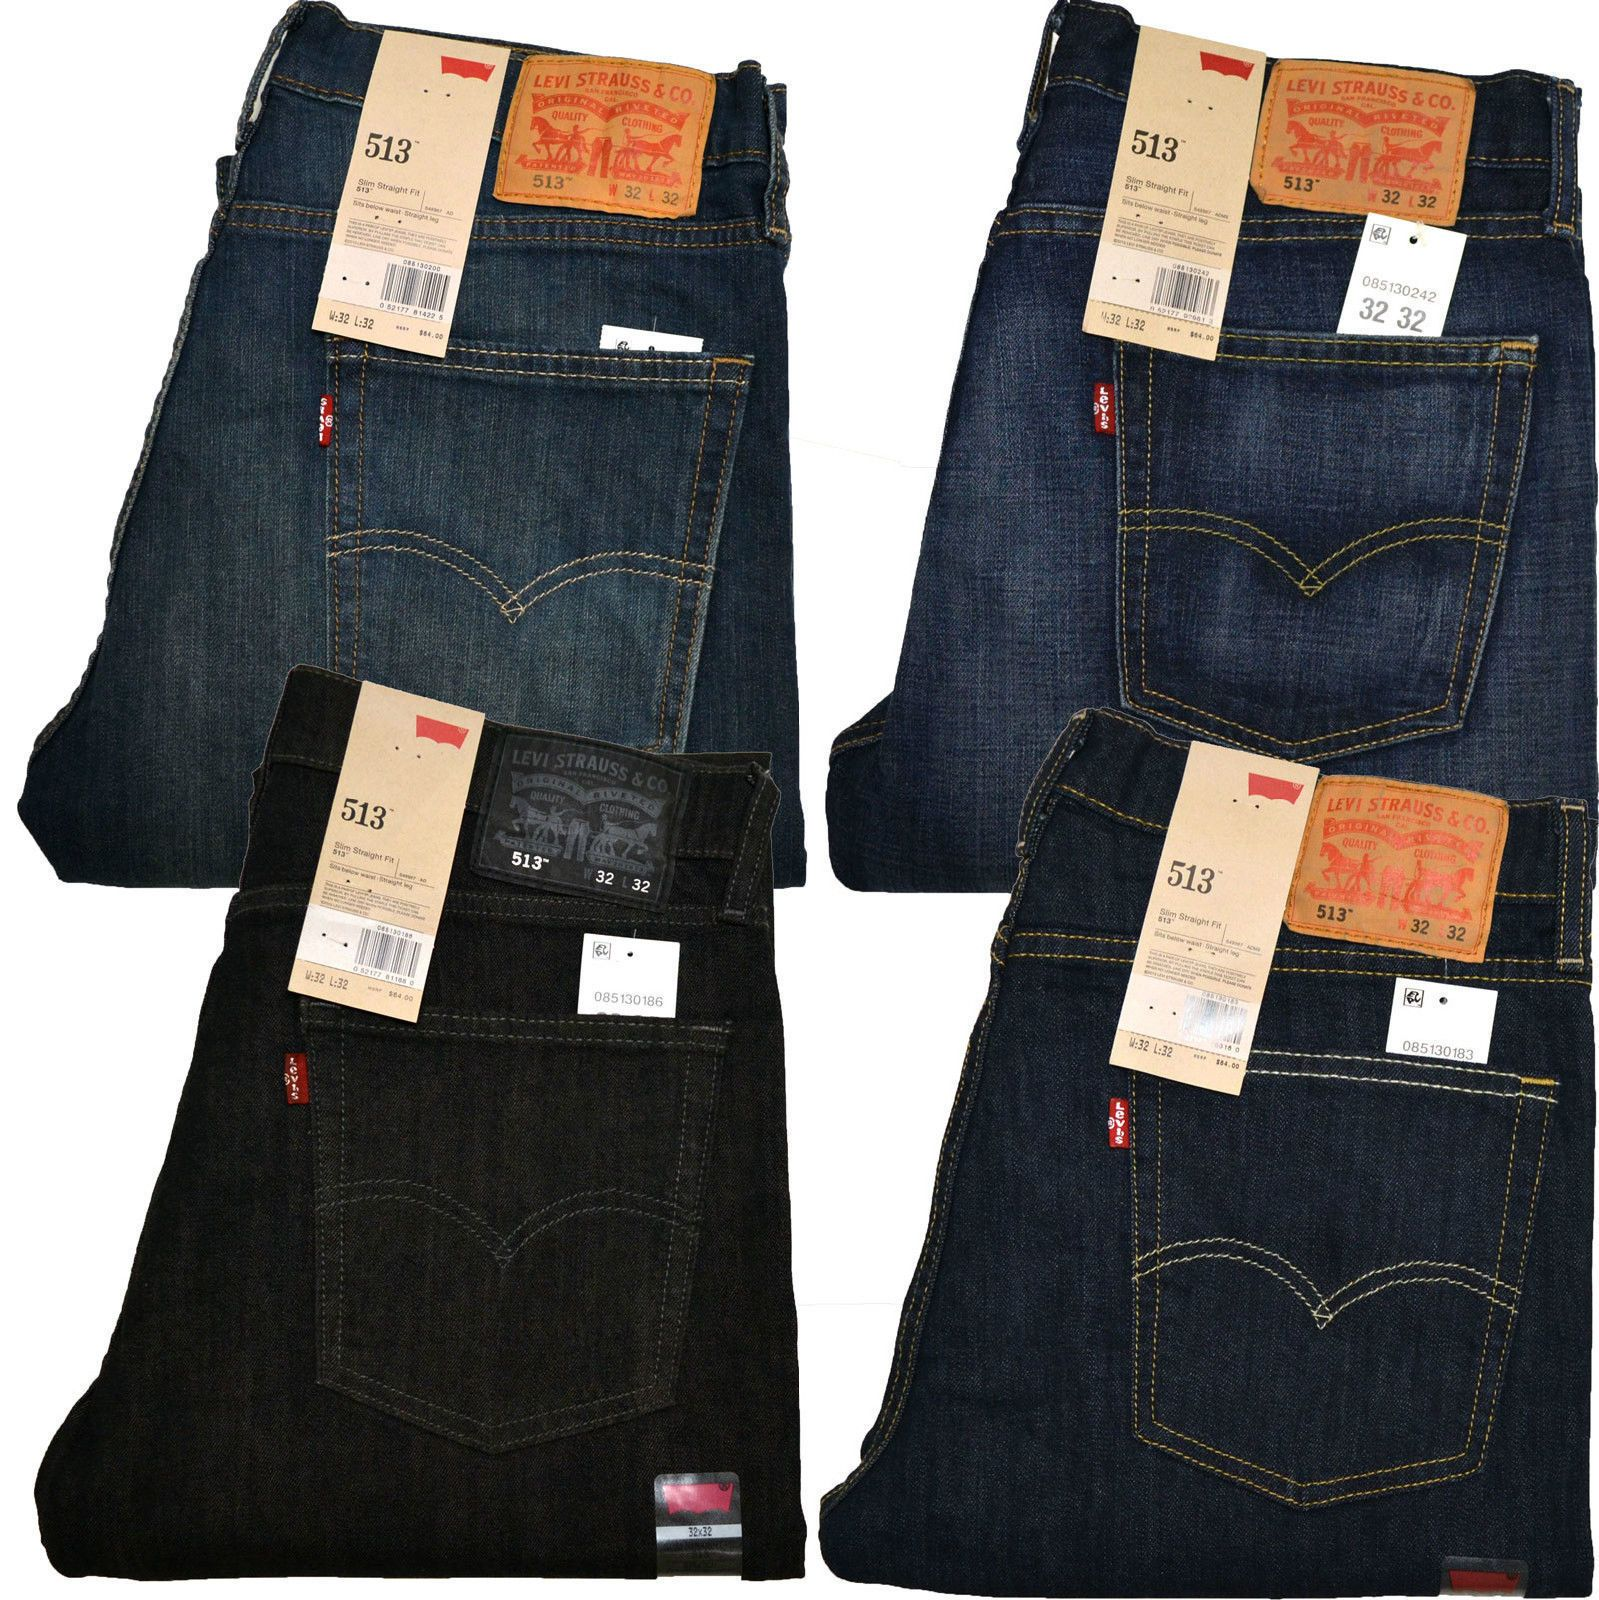 Jeans 11483: Levis 513 Jeans Slim Straight Stonewashed Blue Black Indigo  White All Sizes New -> BUY IT NOW ONLY: $34.99 on eBay!